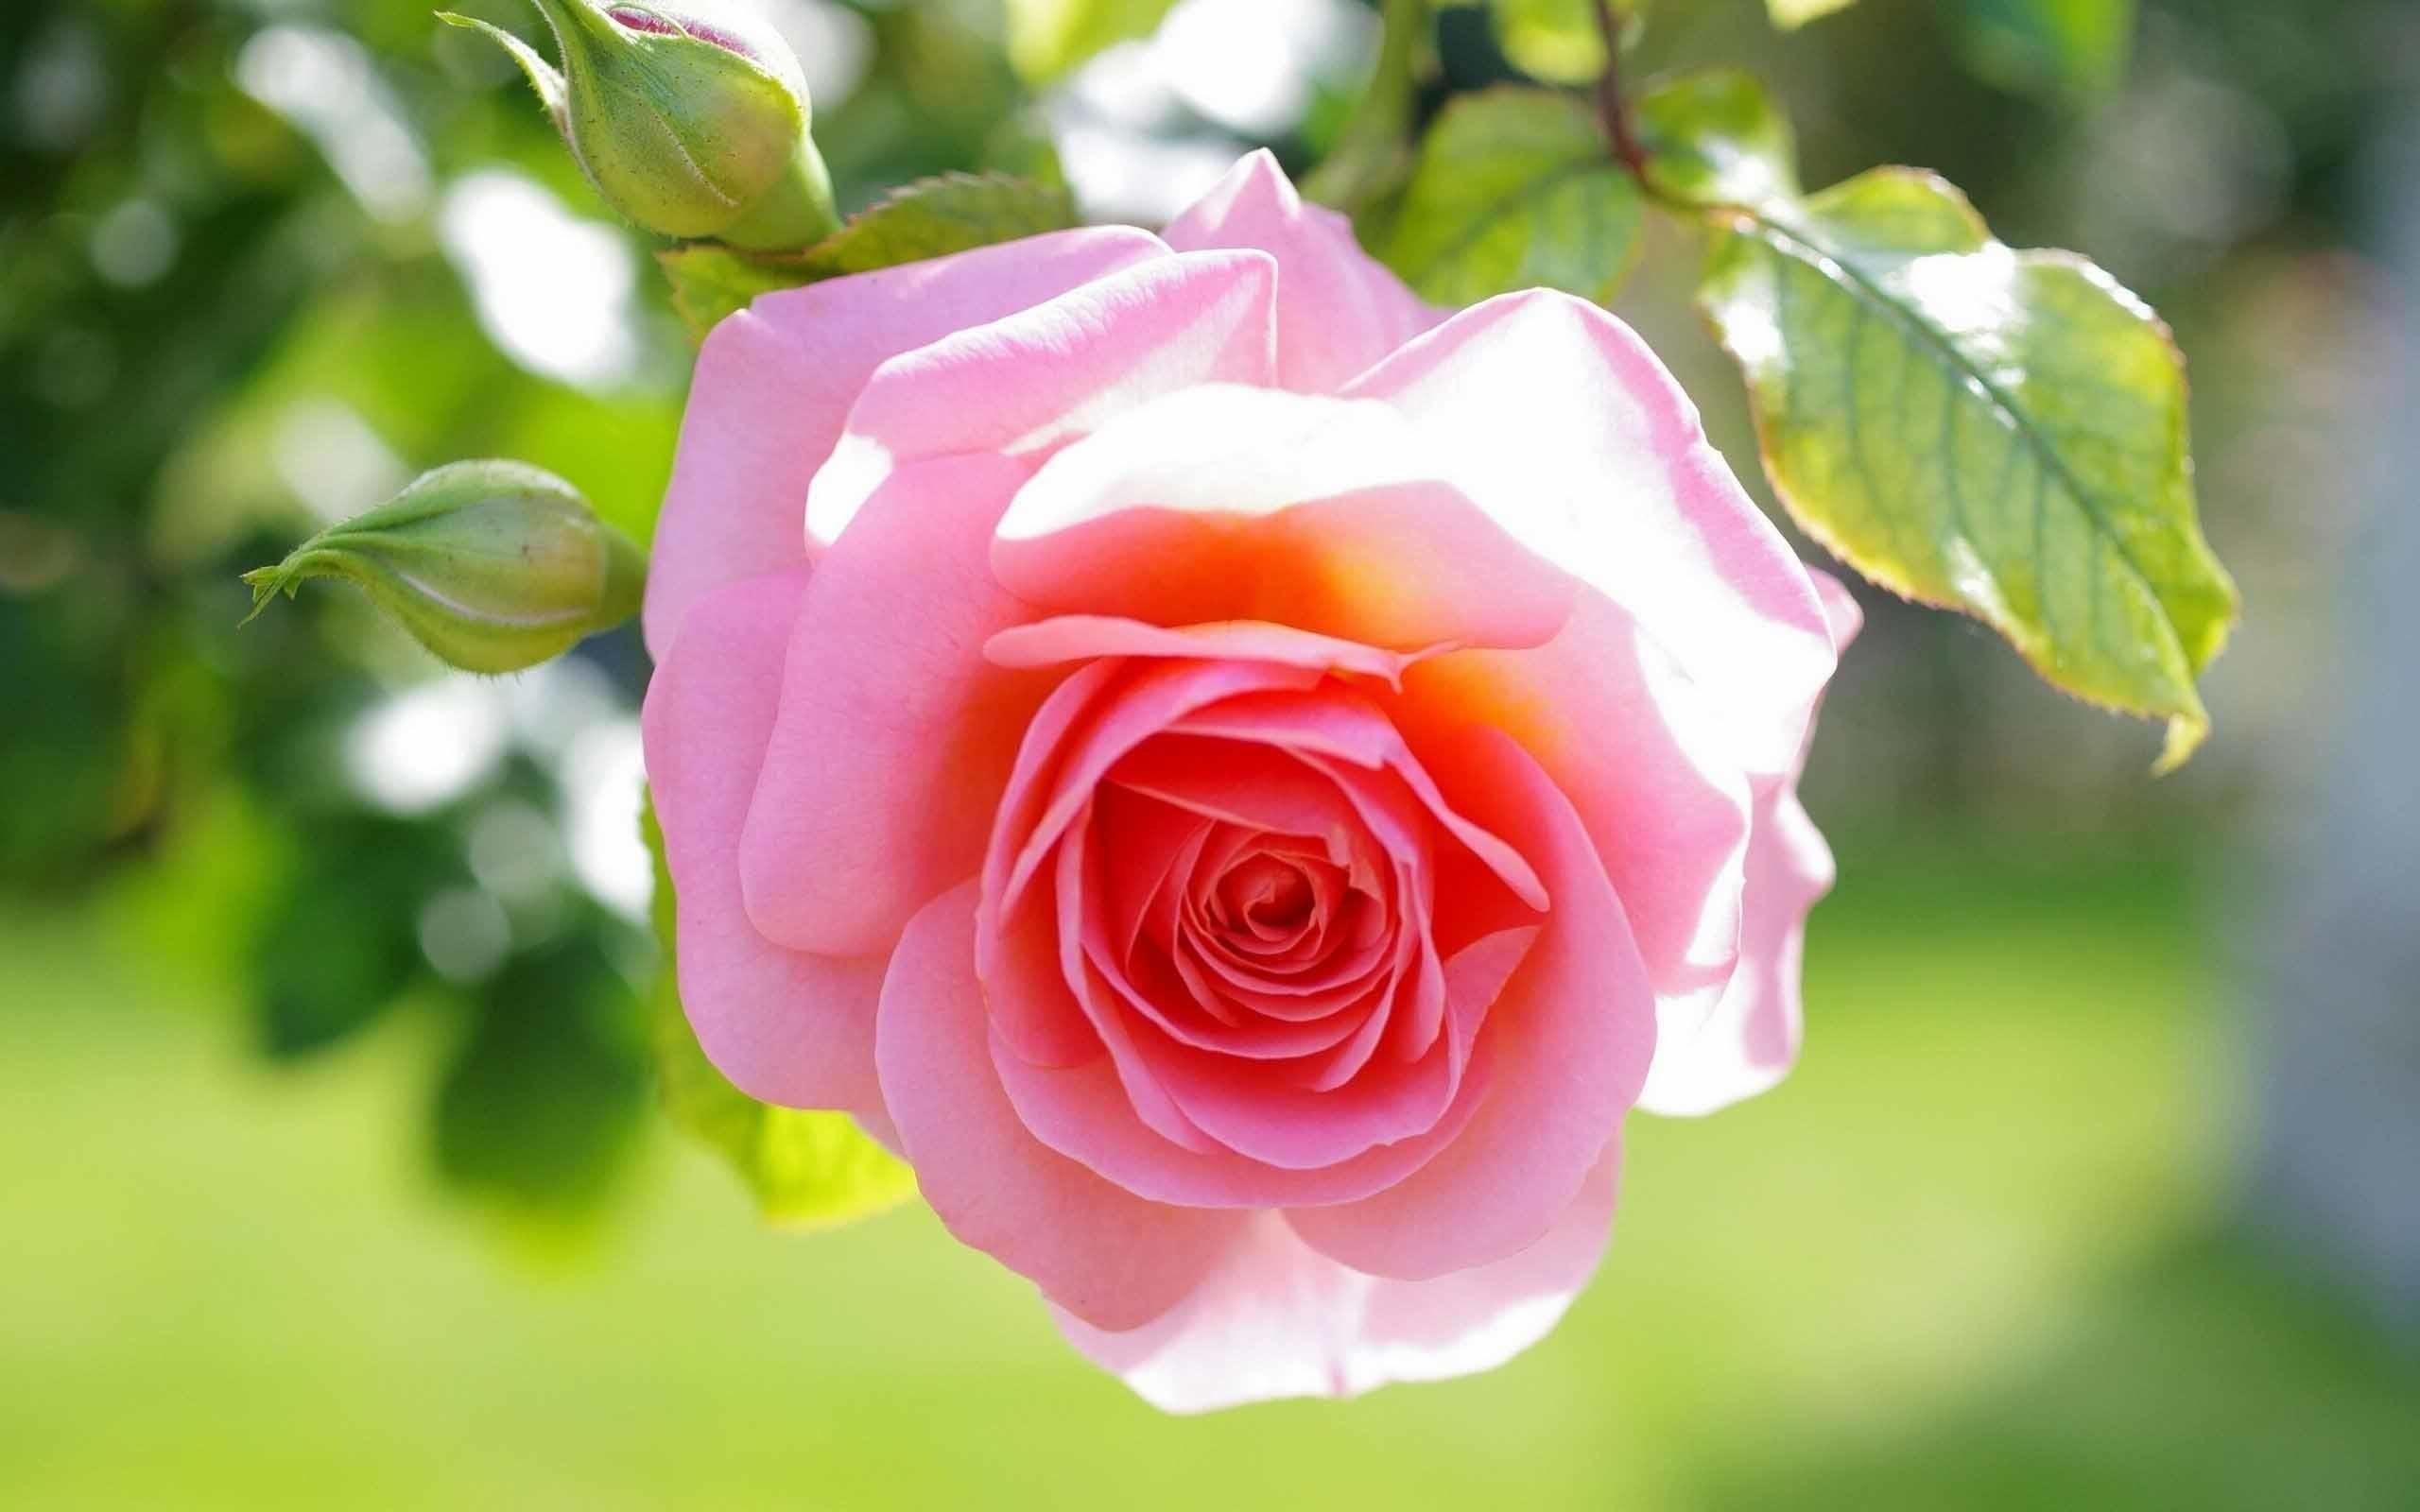 Pink rose sunlight love hd wallpapers